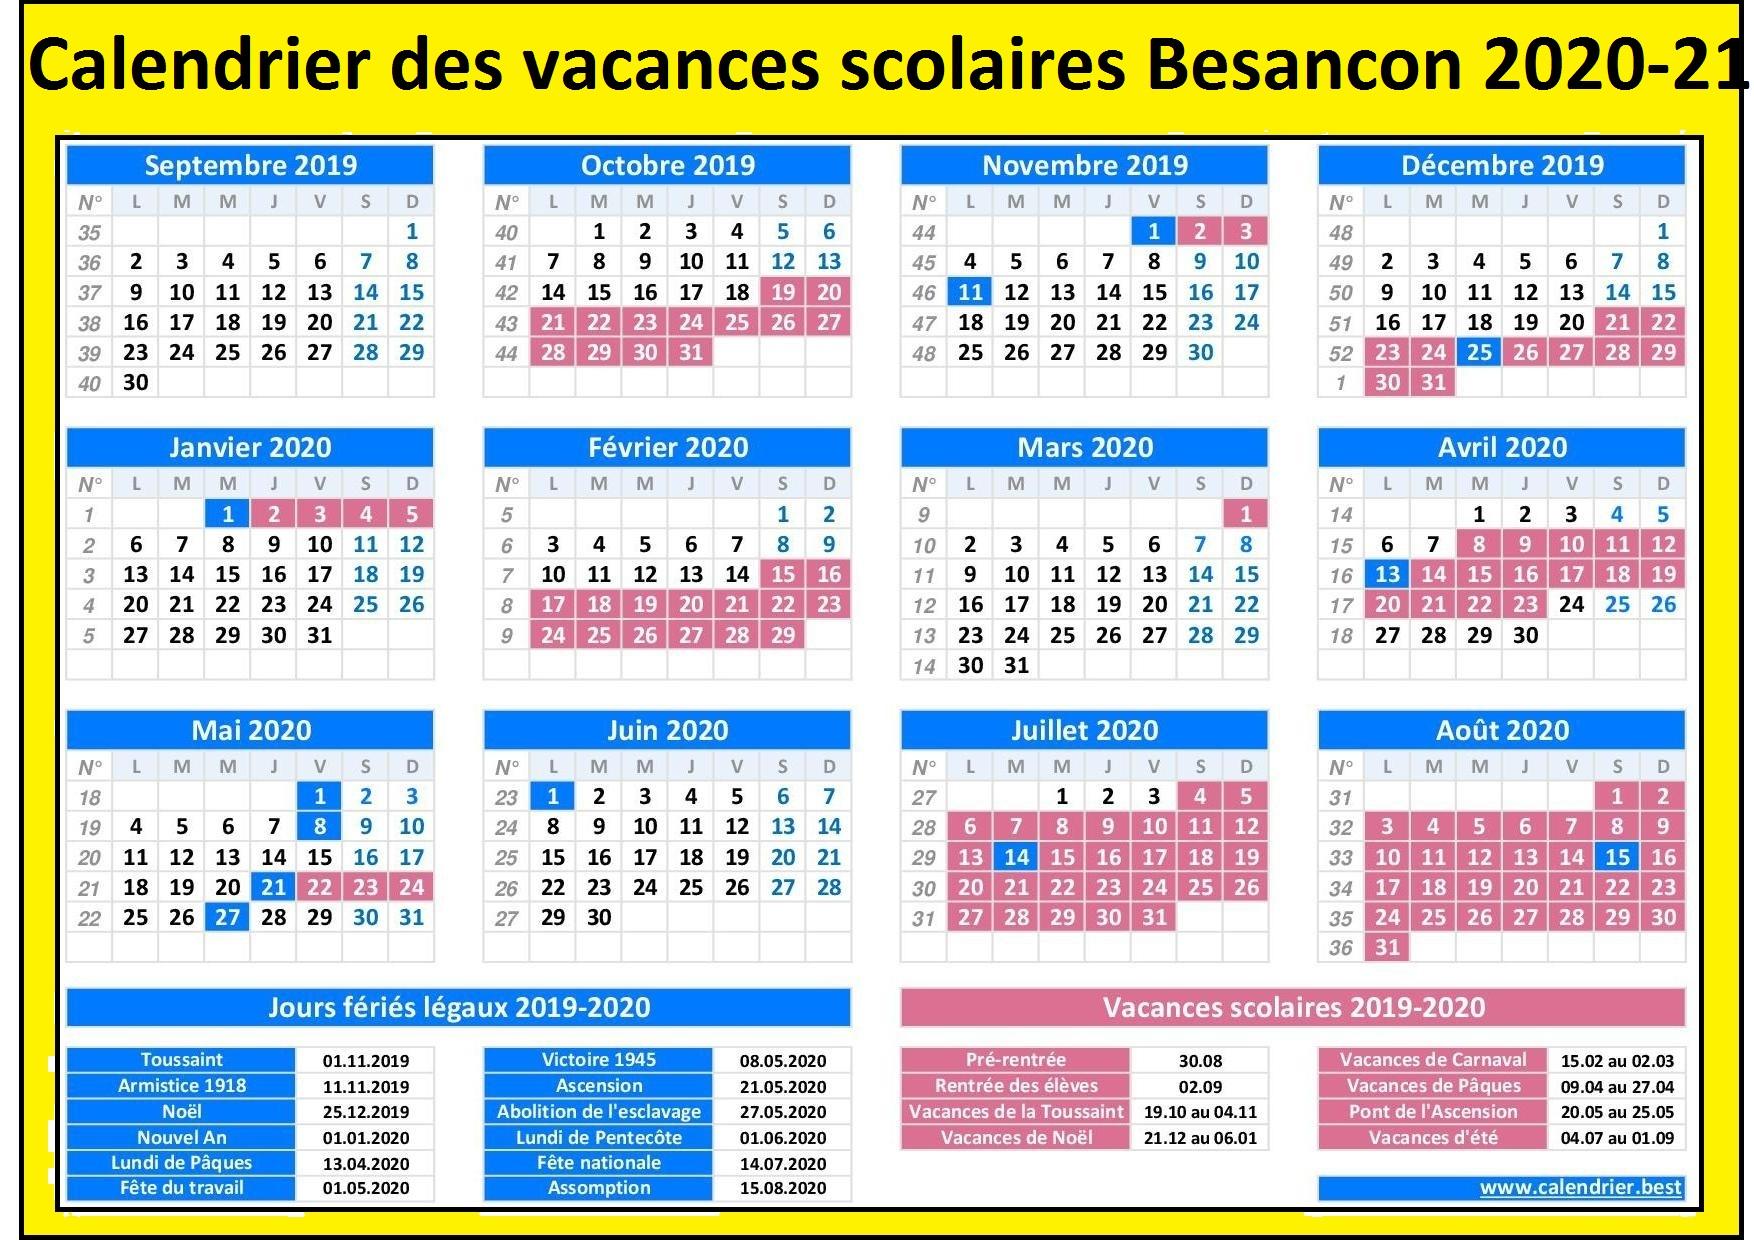 DatesVacancesScolairesBesancon 2020